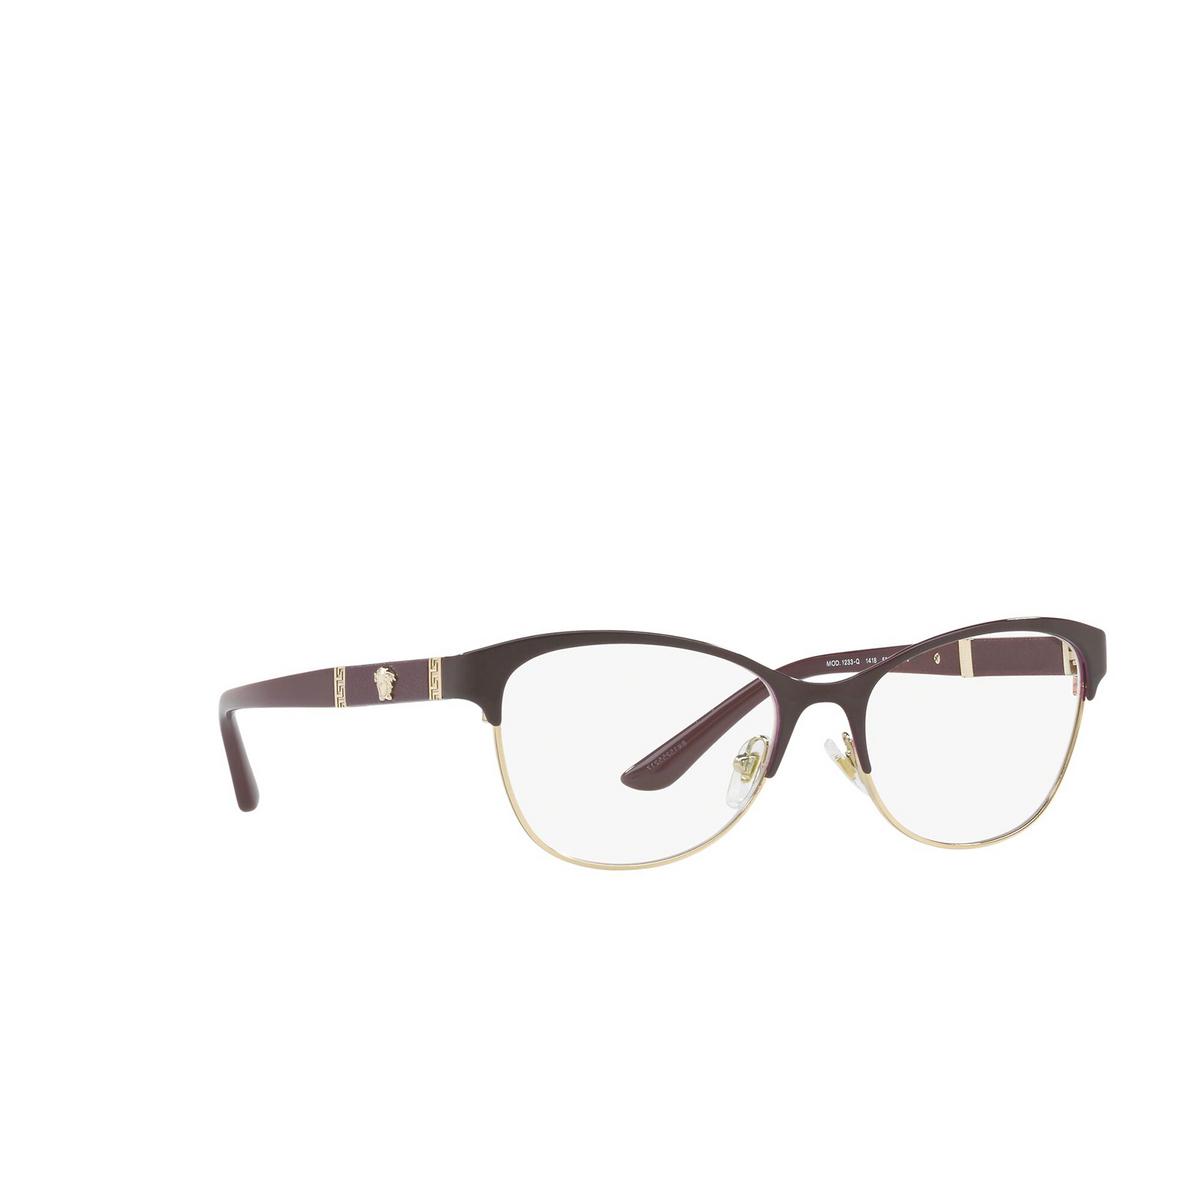 Versace® Cat-eye Eyeglasses: VE1233Q color Black / Pale Gold 1366.